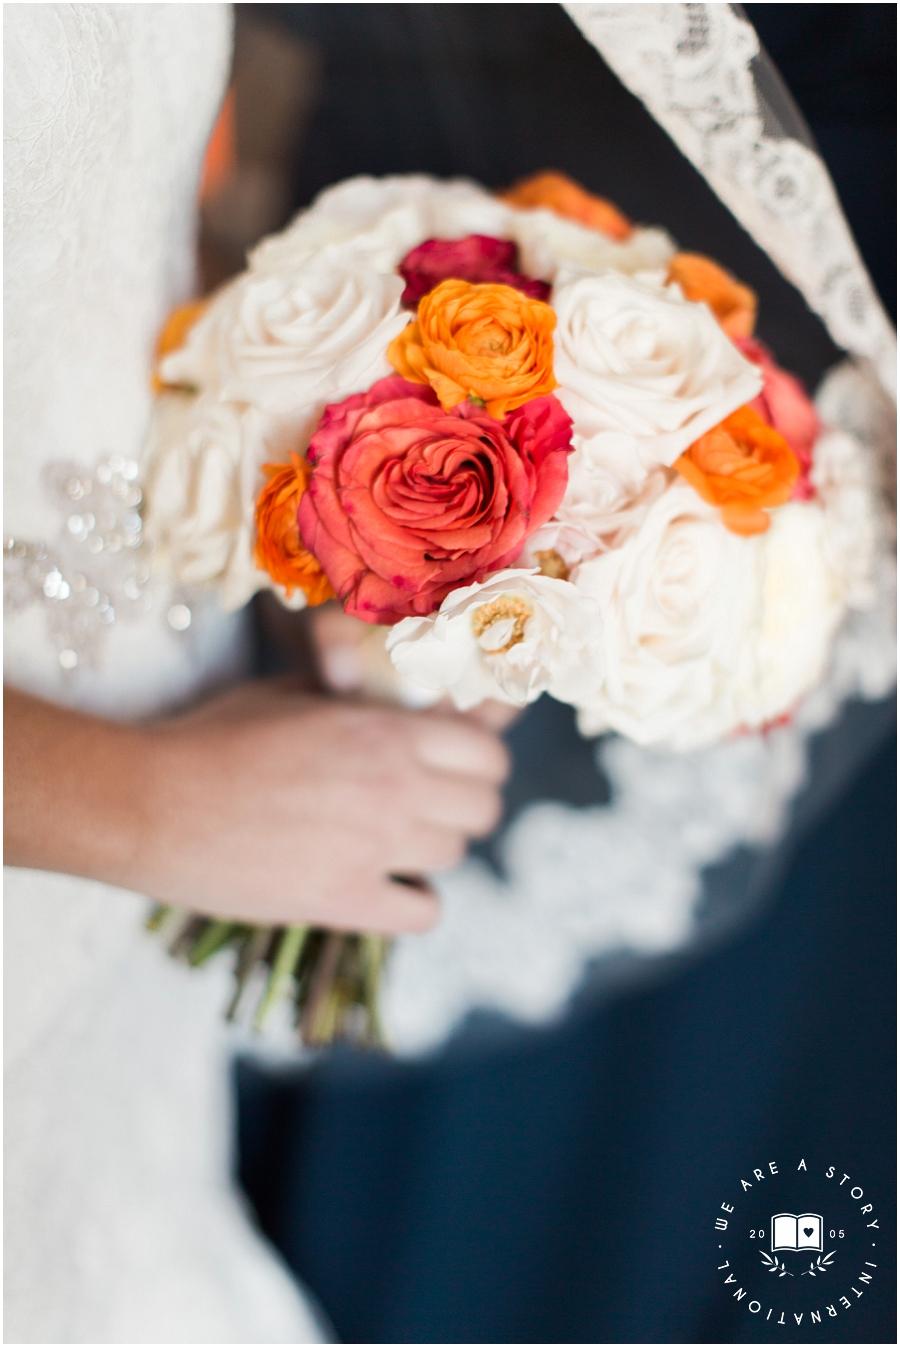 Four Seasons wedding photographer Las Vegas _ We Are A Story wedding photographer_2473.jpg